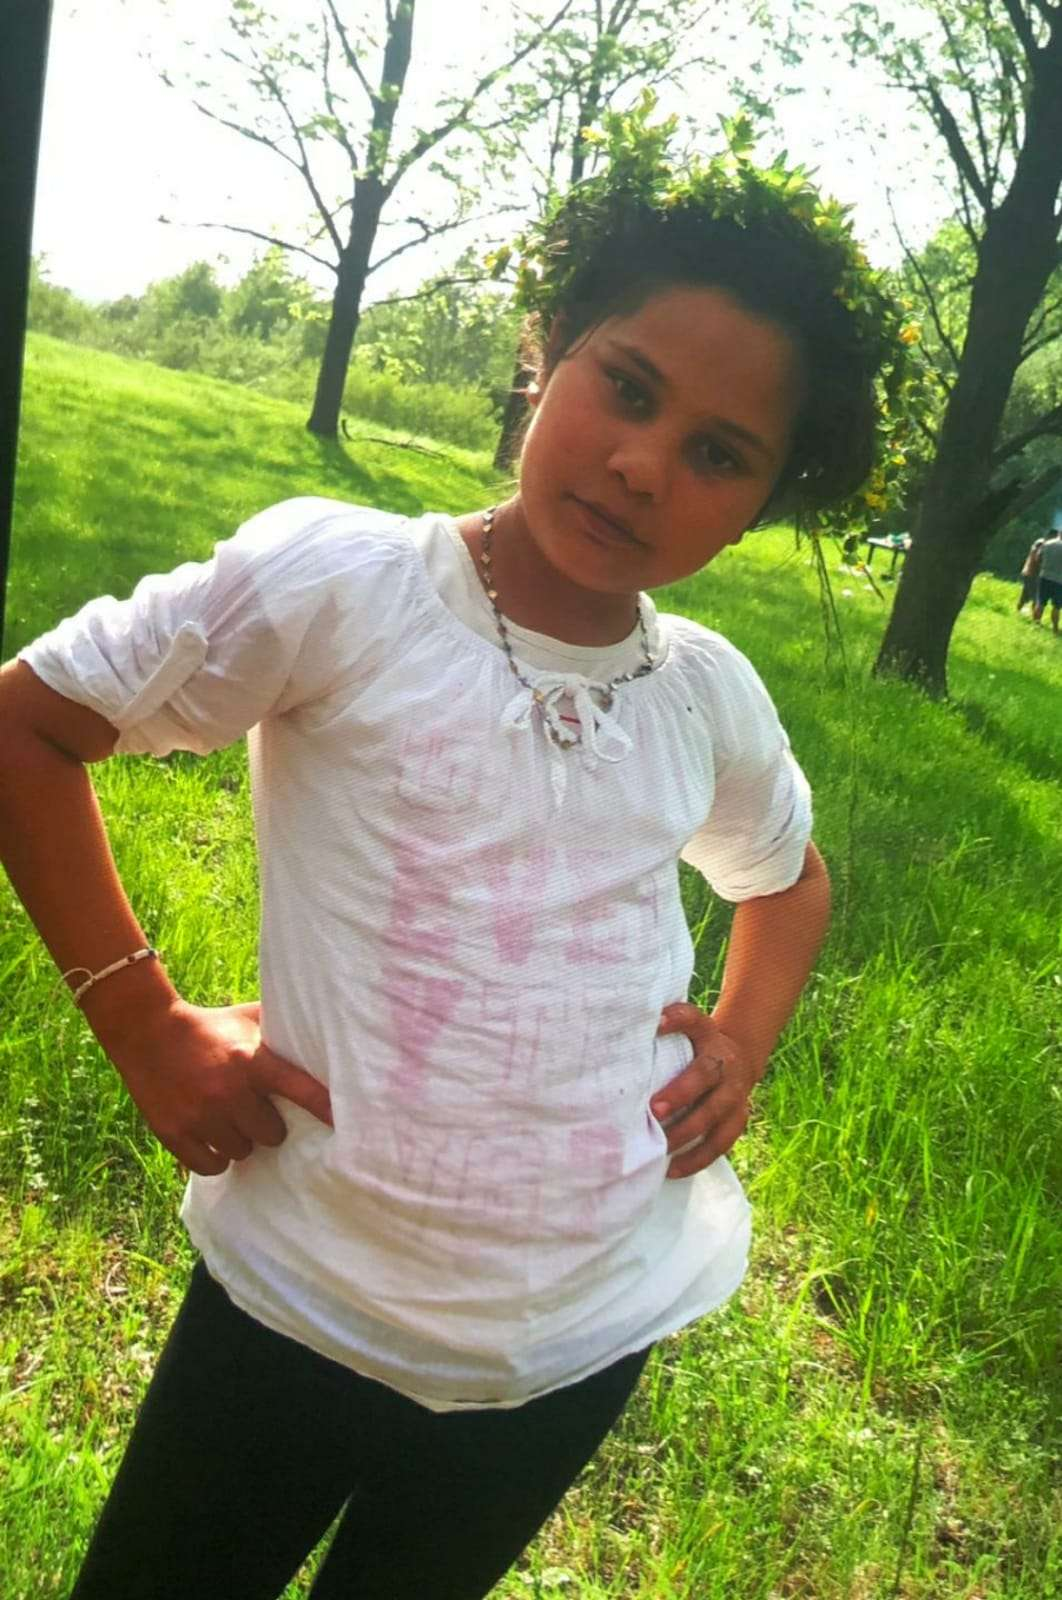 Alerta! A disparut o fata de 11 ani din Gura Sutii